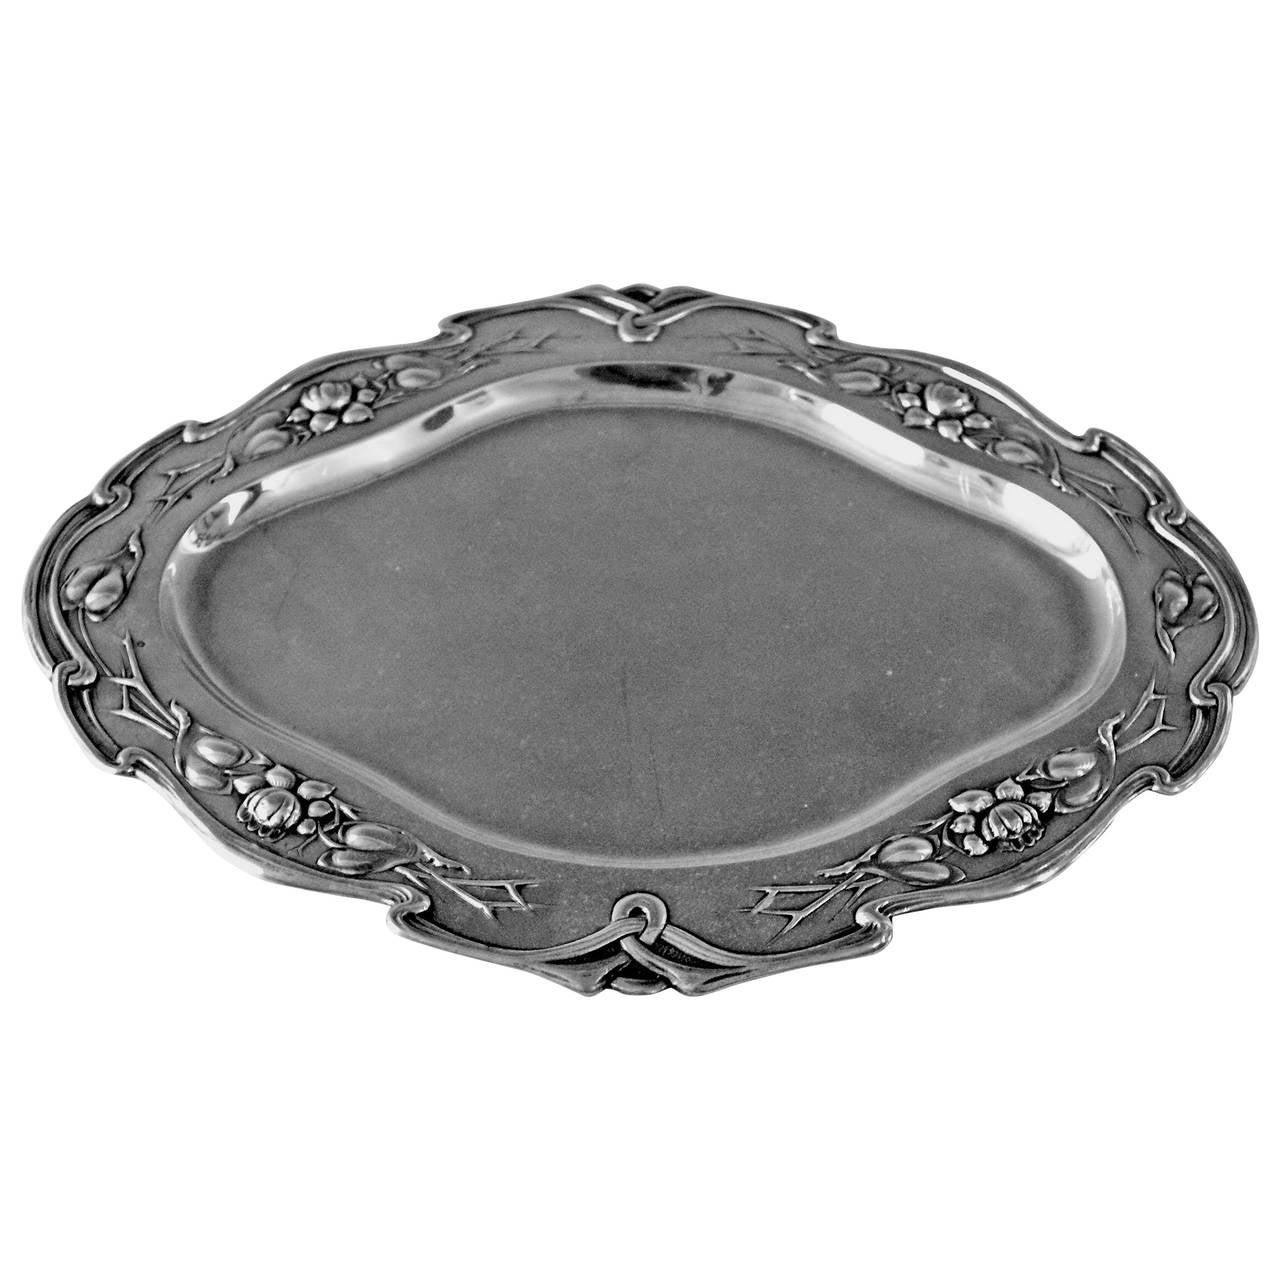 Silver Austrian Excellent Serving Platter, circa 1905 1